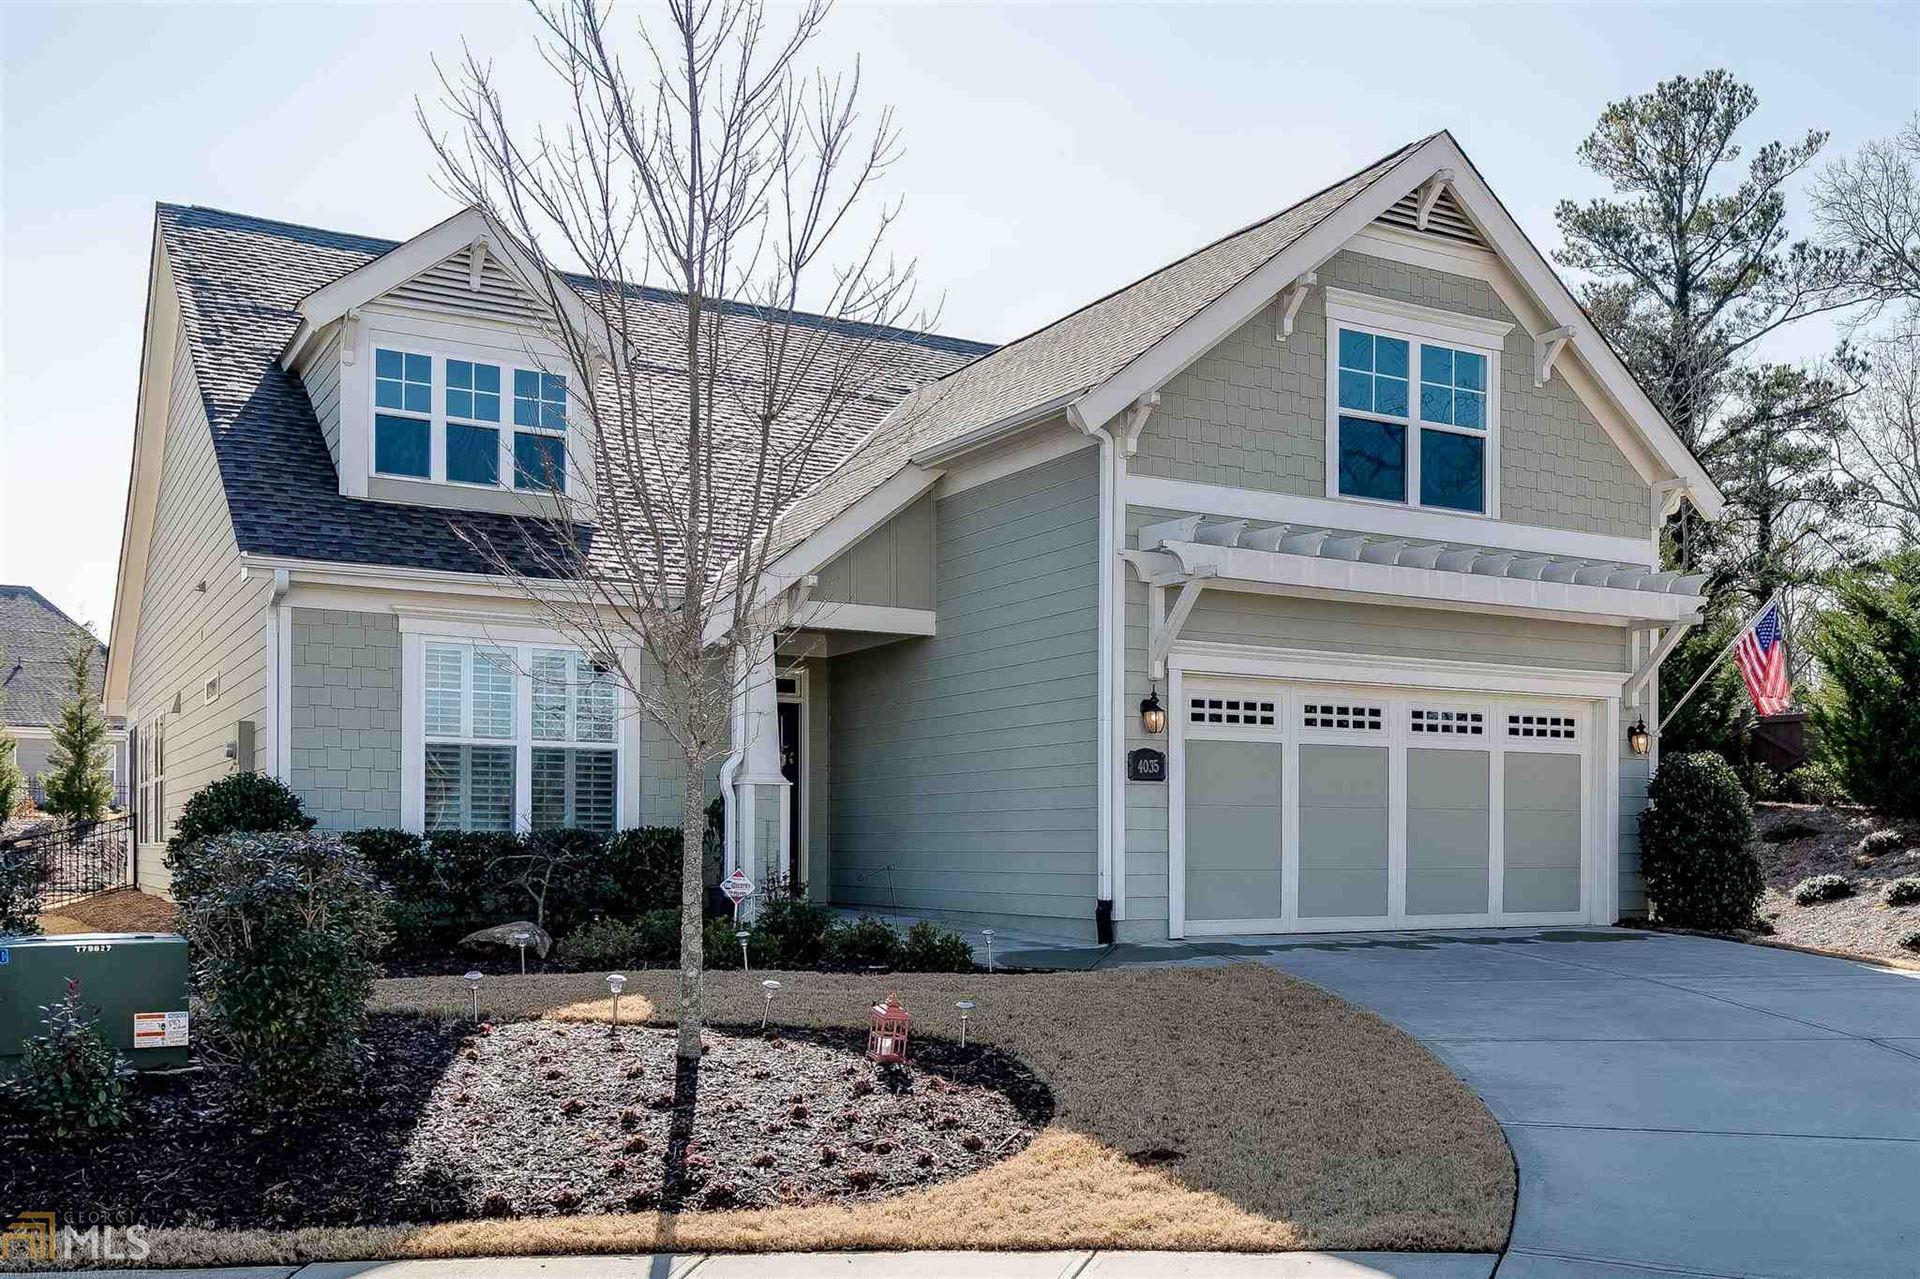 4035 Great Pine Dr, Gainesville, GA 30504 - MLS#: 8907928